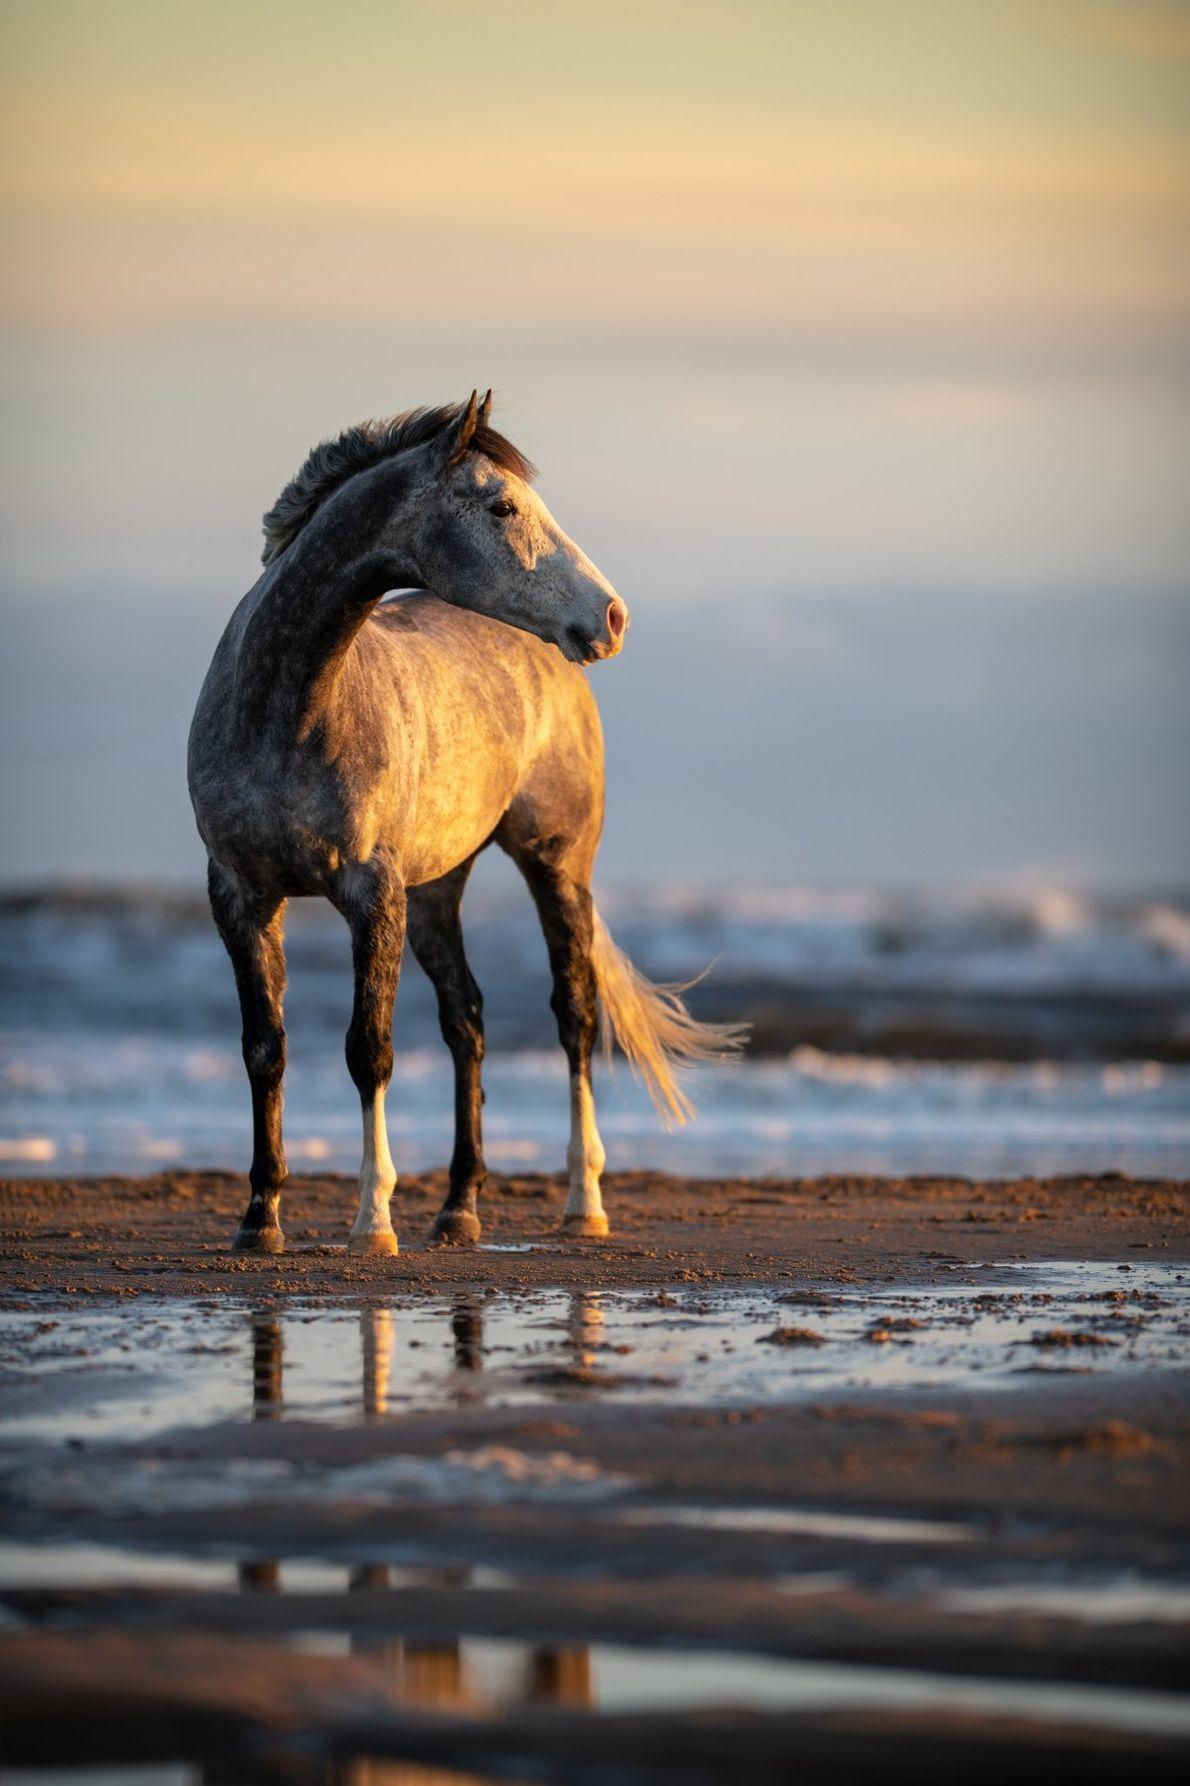 Your Shot photographer Alexandra Revenge captured this equine portrait on the beaches of Hartlepool, England.